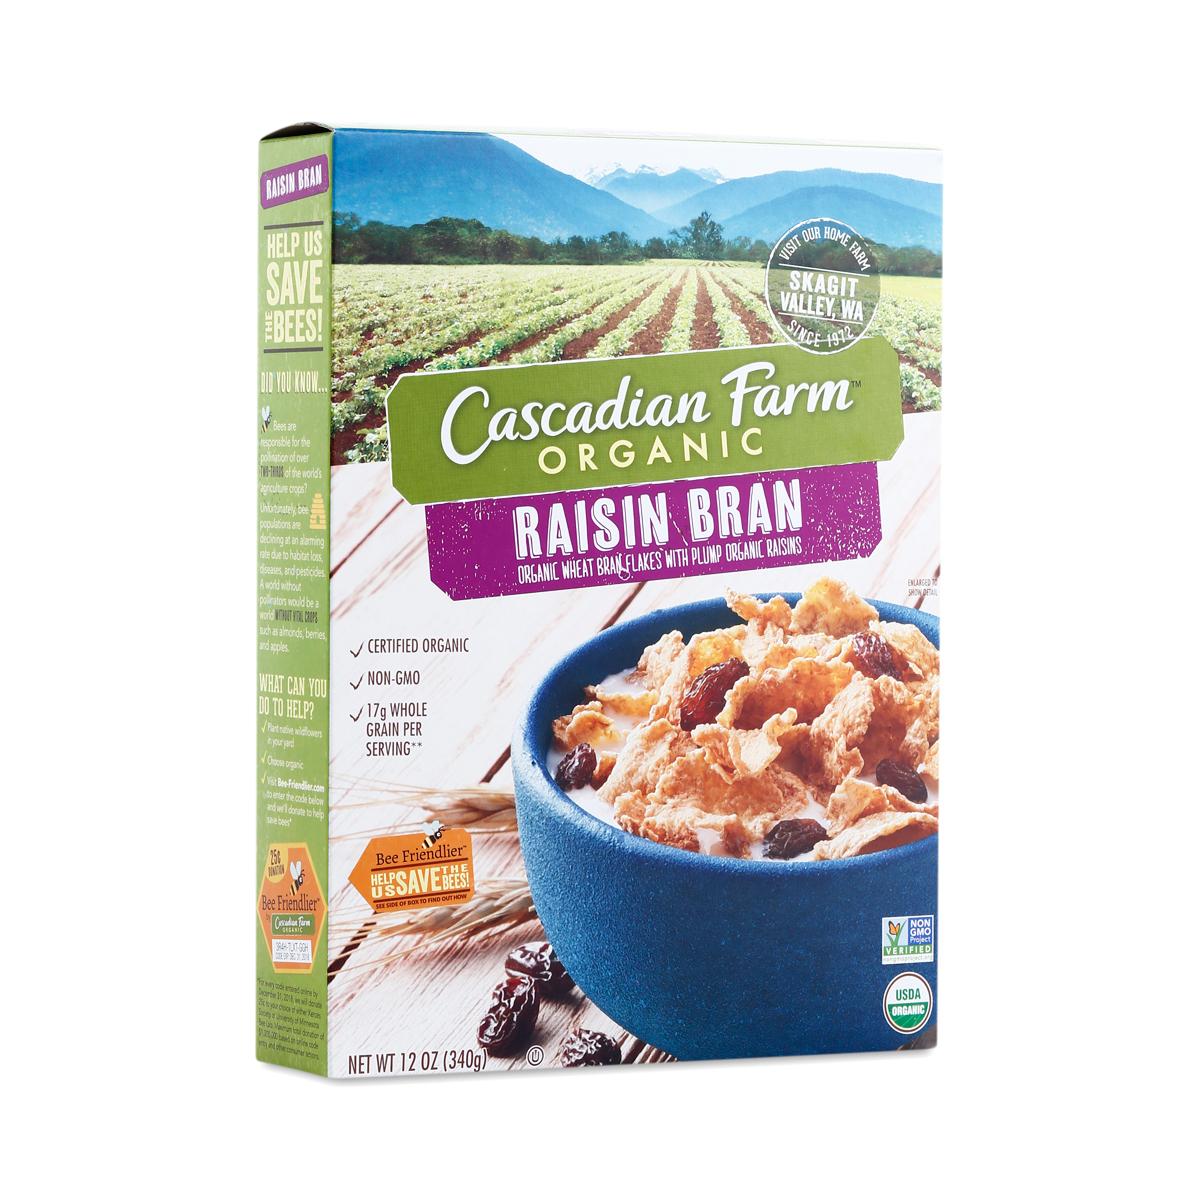 12 Oz Raisin Bran Cereal By Cascadian Farm